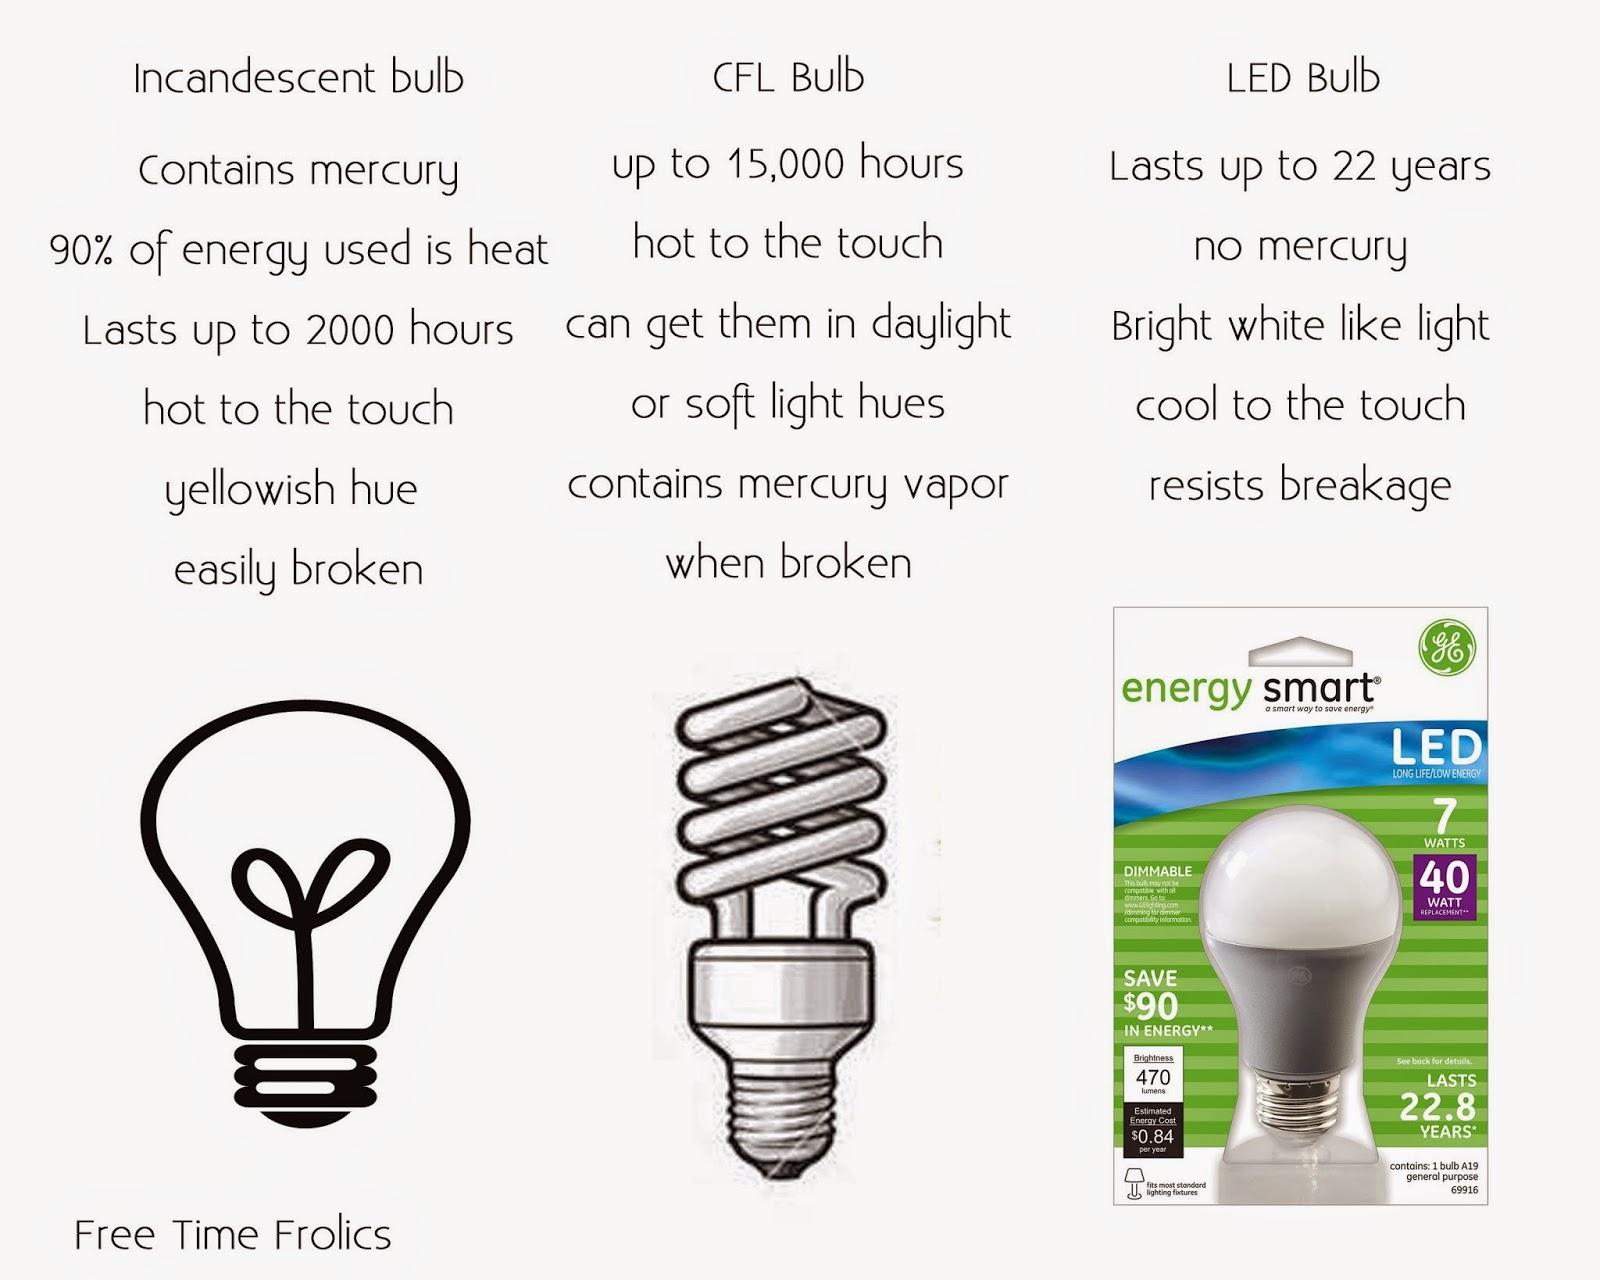 Light bulb comparison www.freetimefrolics.com #shop #LEDSavings